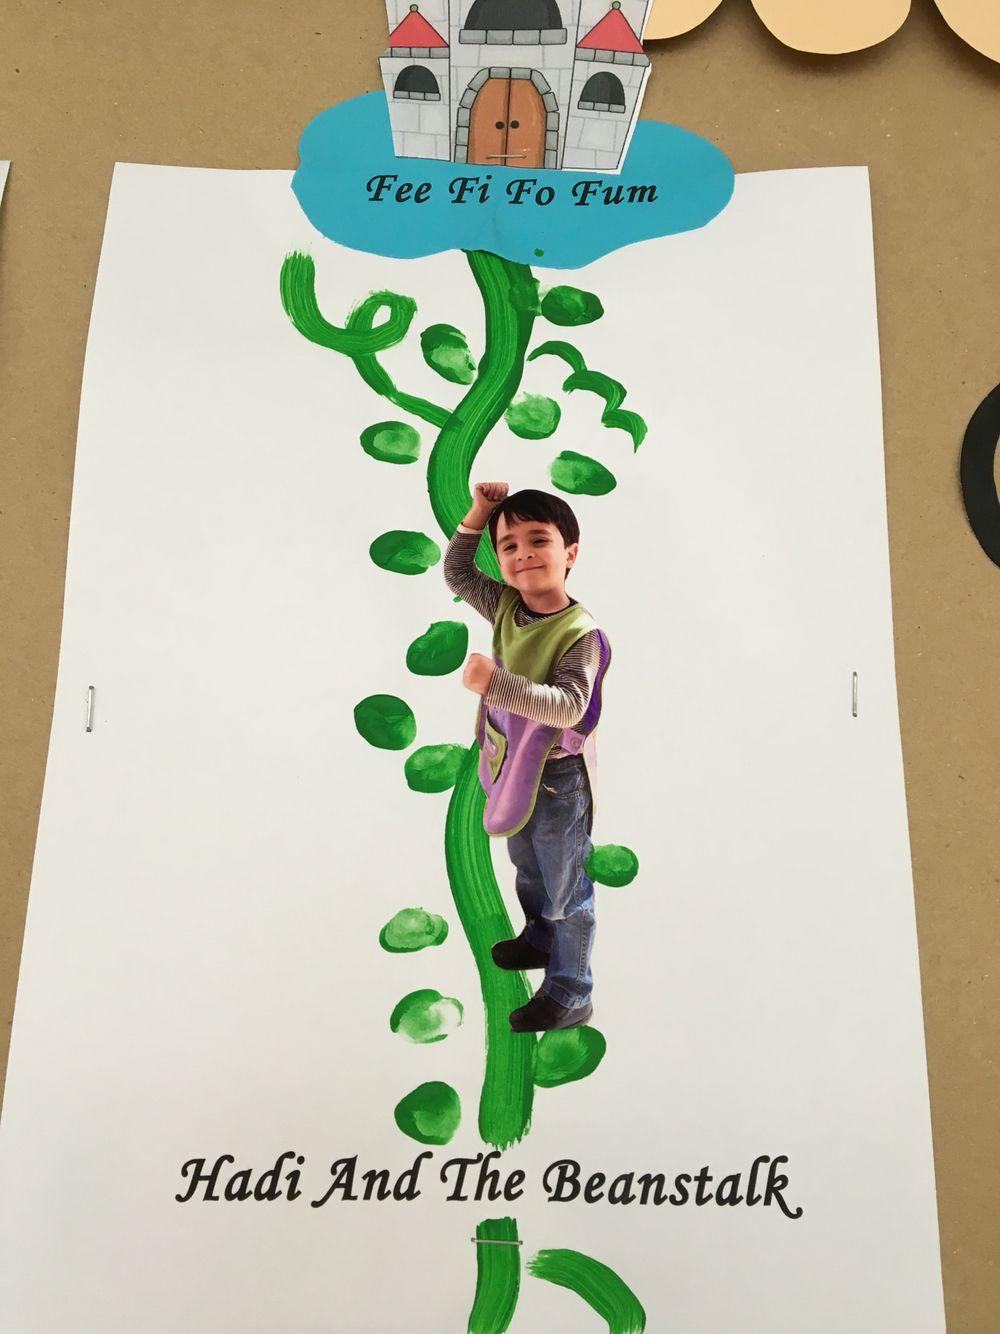 Jack And The Beanstalk Art Ideas